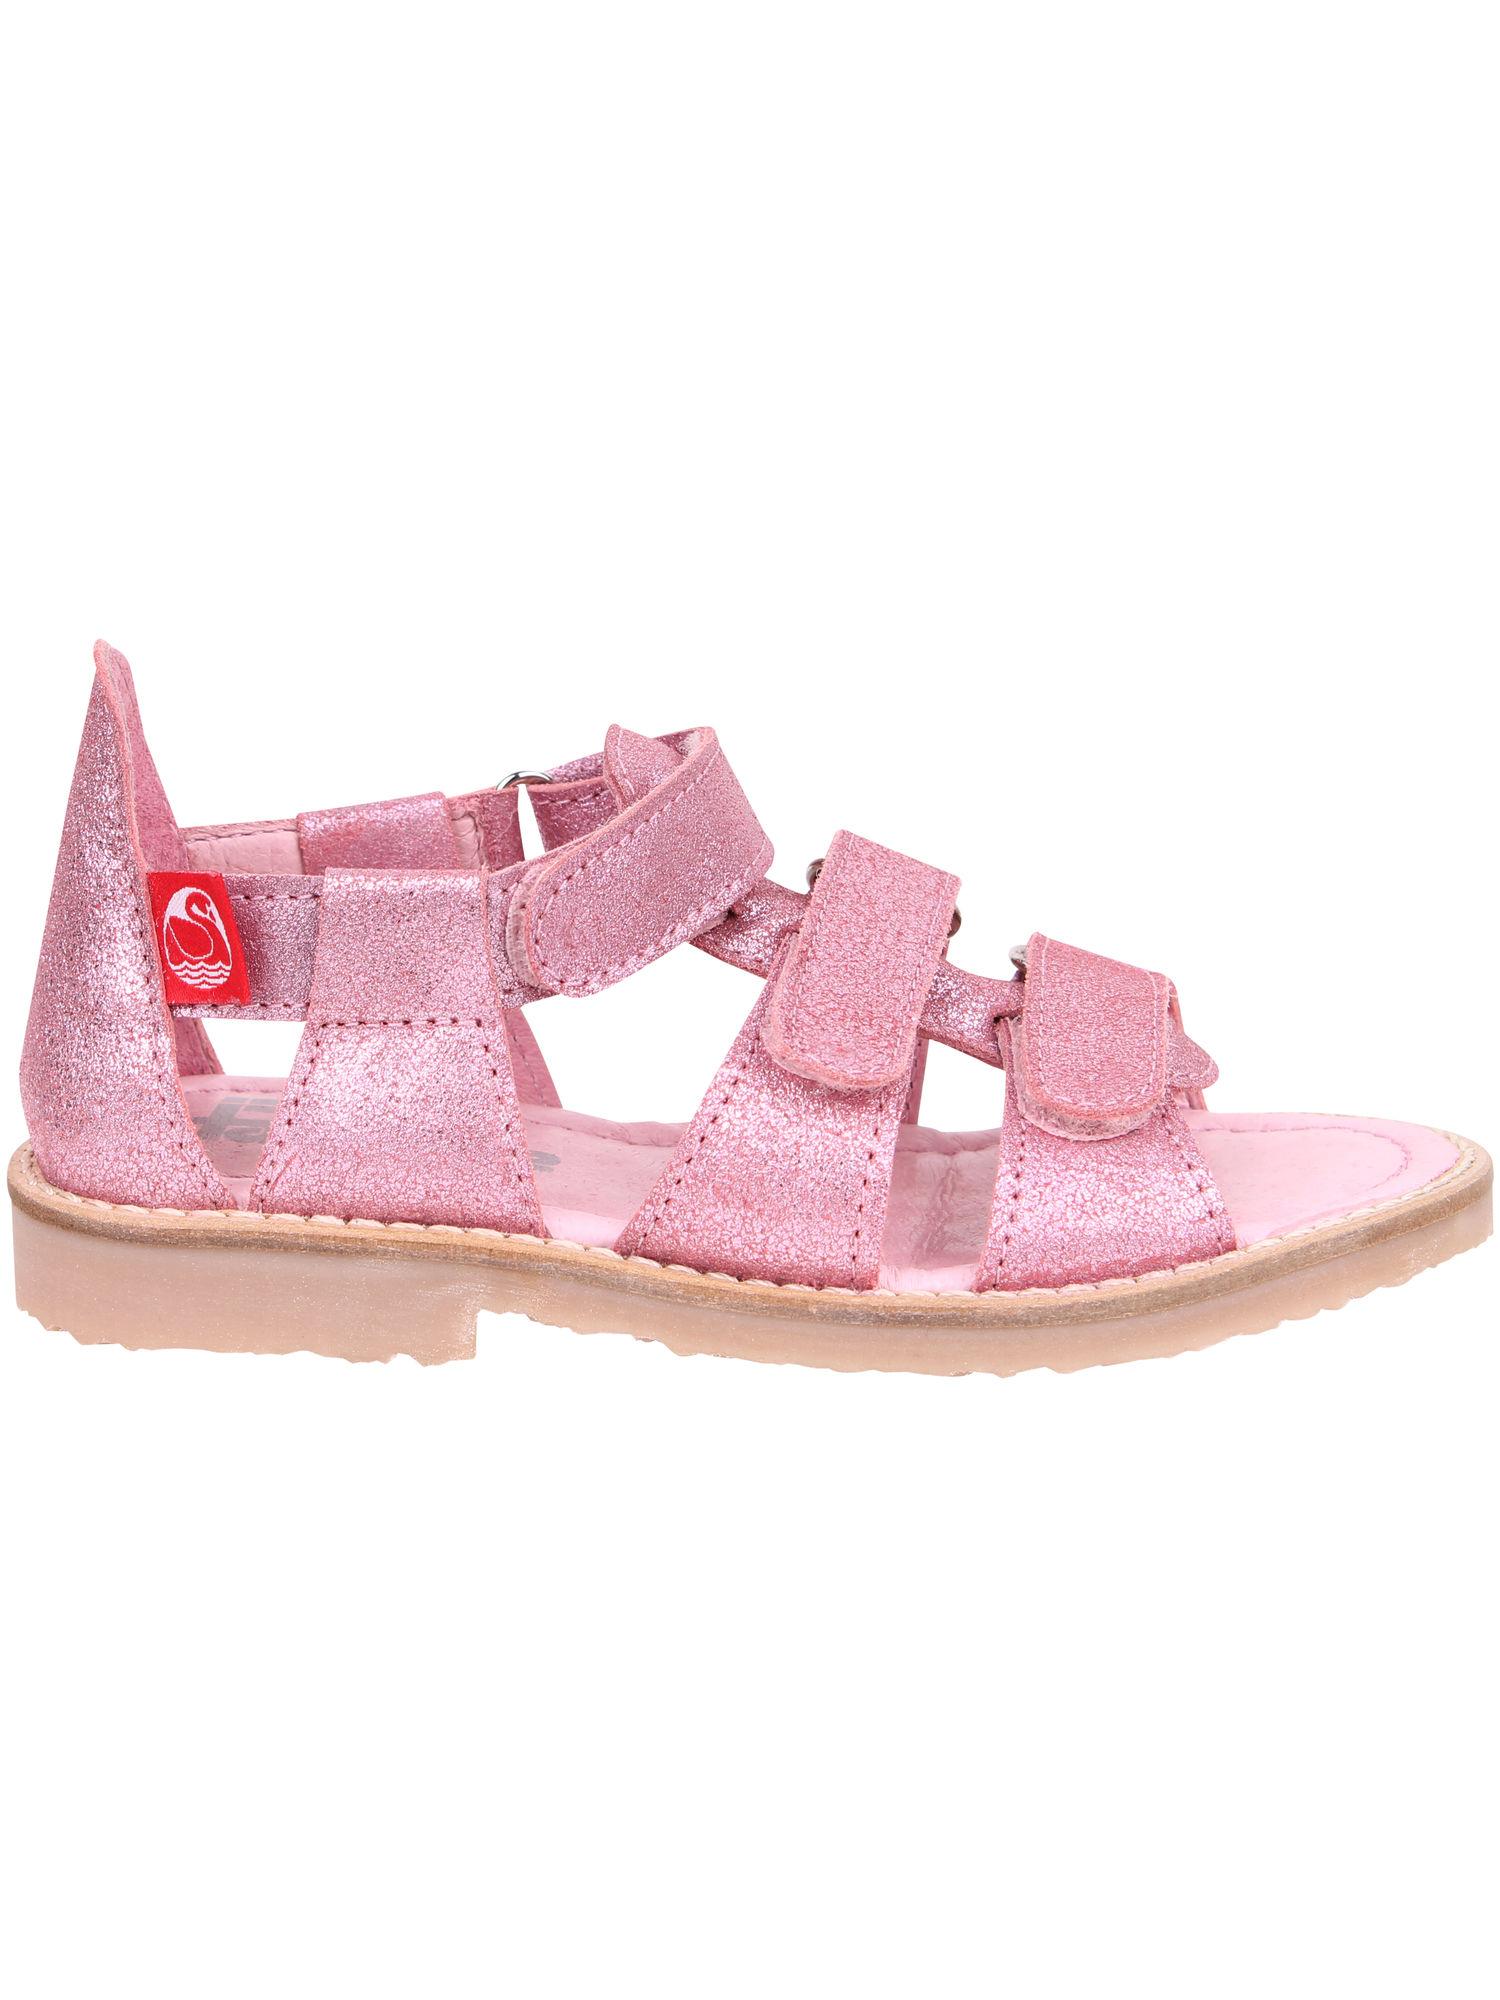 Low sandal (28-37) Pink GLITTER